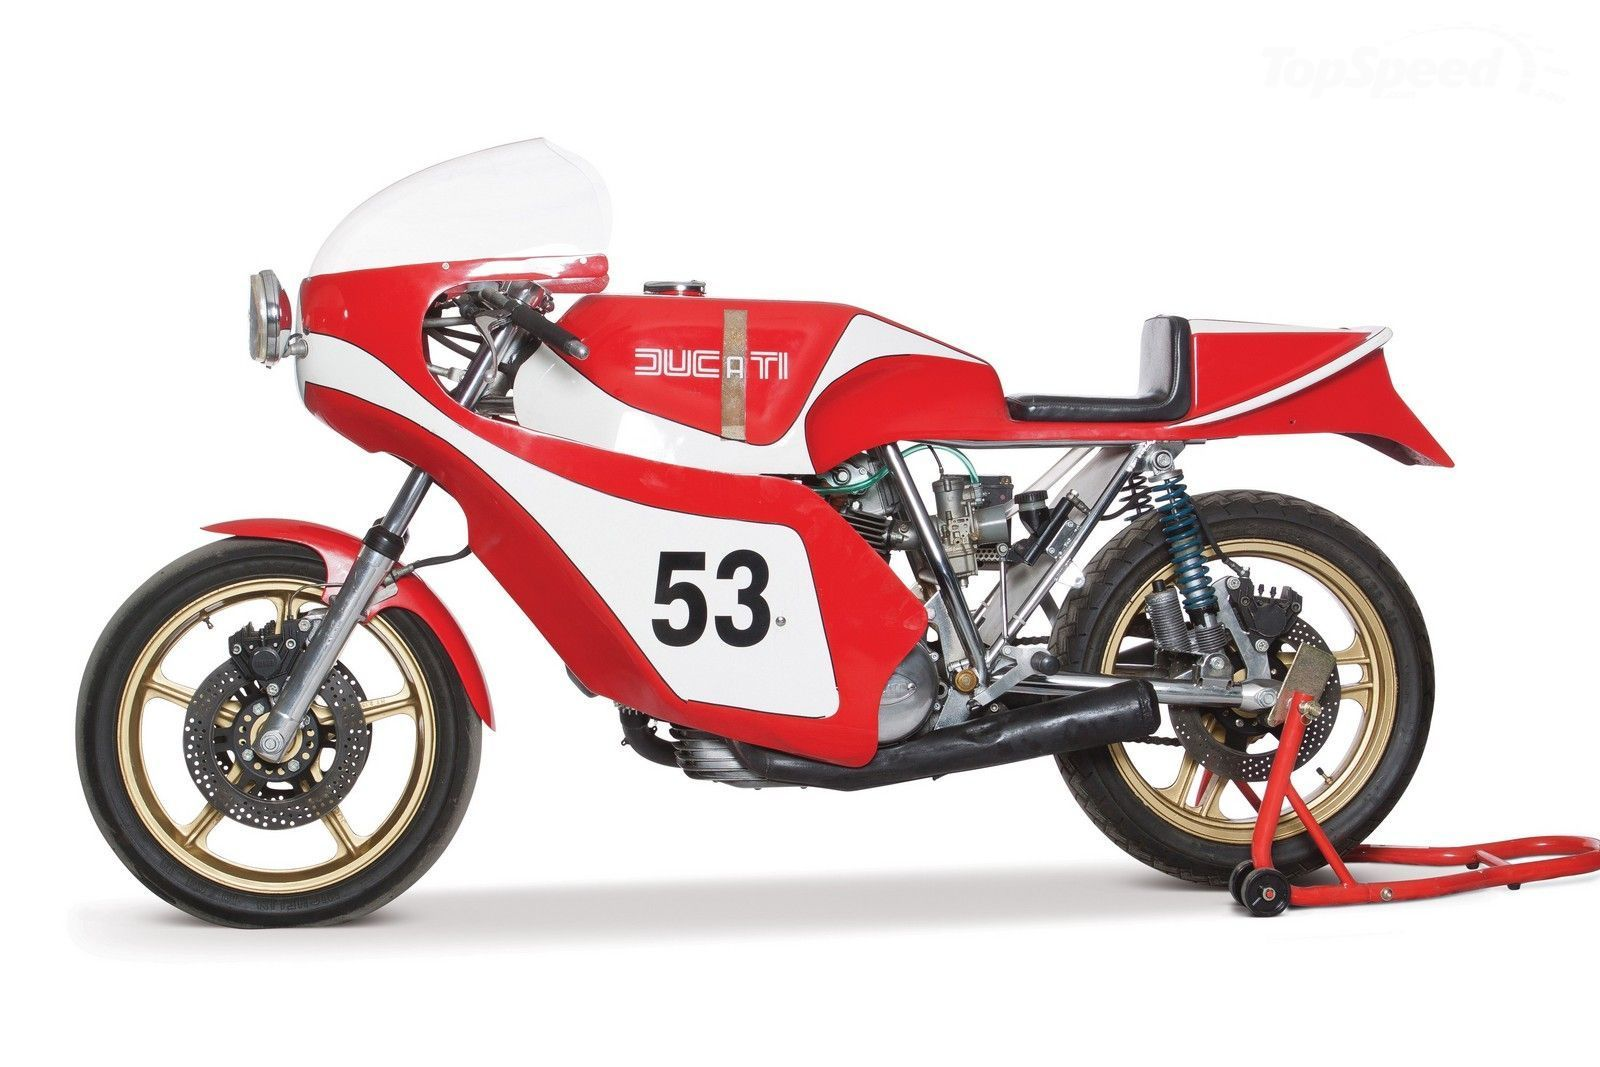 1975 ducati 750 ss corsa moto gp grand prix wsbk tt and other racing motorcycles. Black Bedroom Furniture Sets. Home Design Ideas